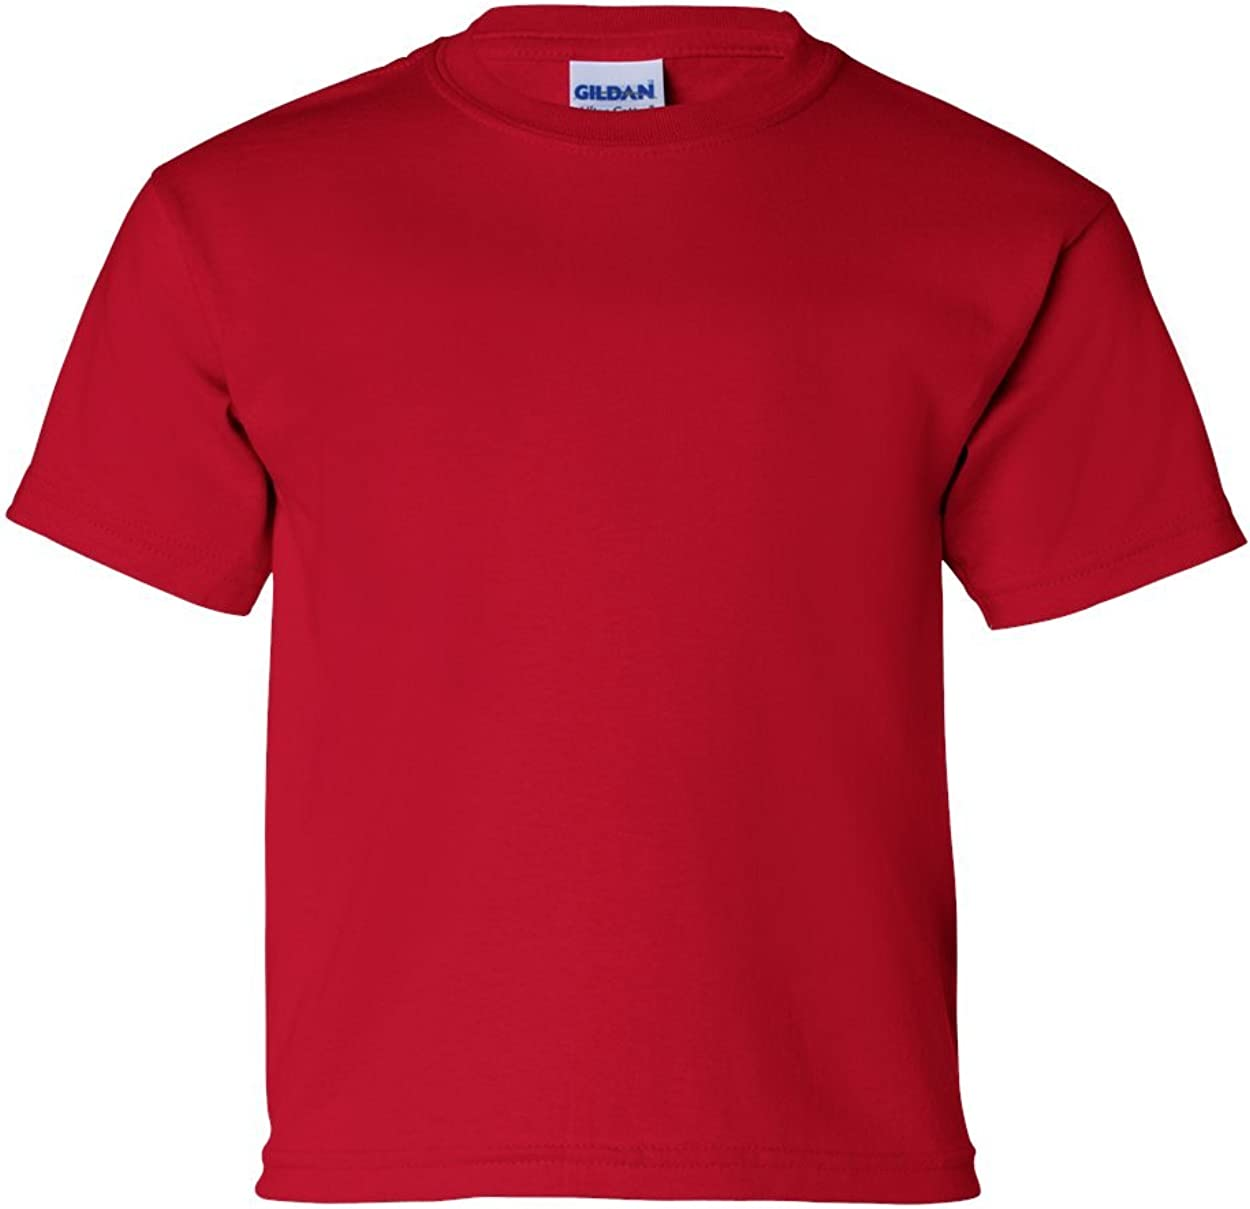 Cotton T-Shirt (G200B) Cherry Red, XL (Pack of 12)